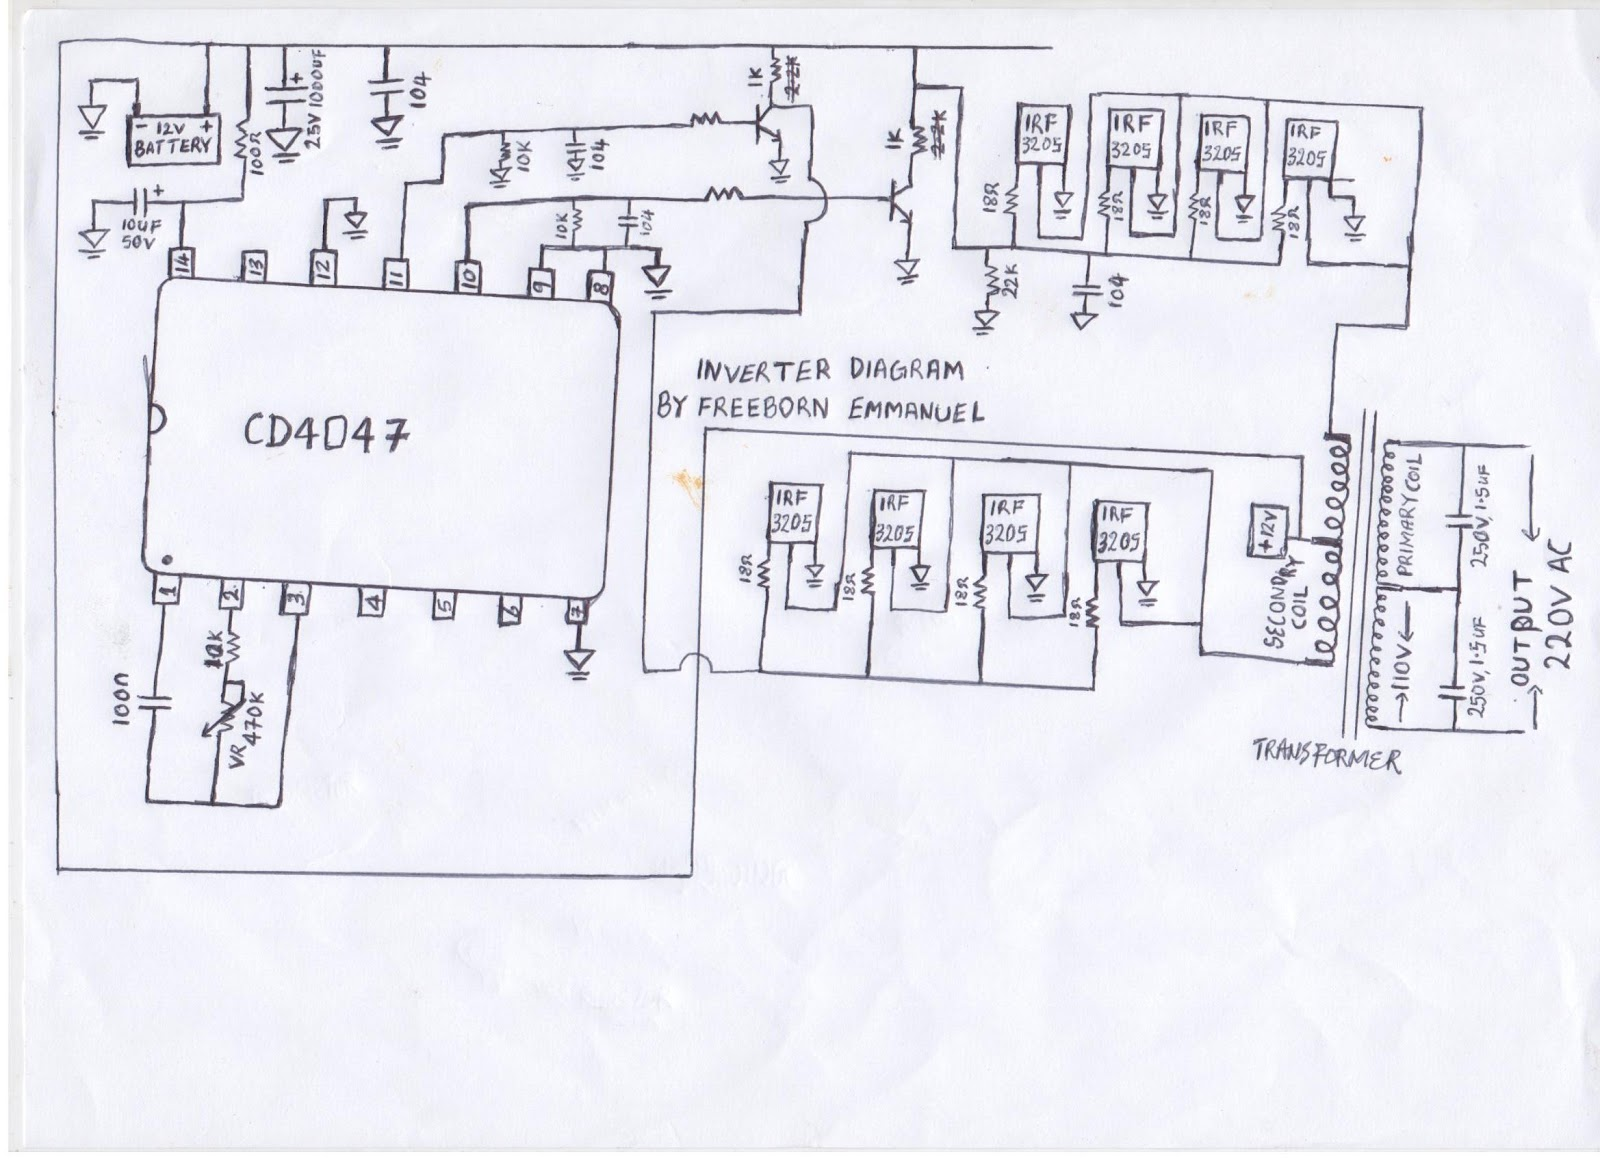 Hitachi Air Conditioner Wiring Diagram Ford Xd Fuse Box Tos30 Cdwiring2 Operazionerestauro It